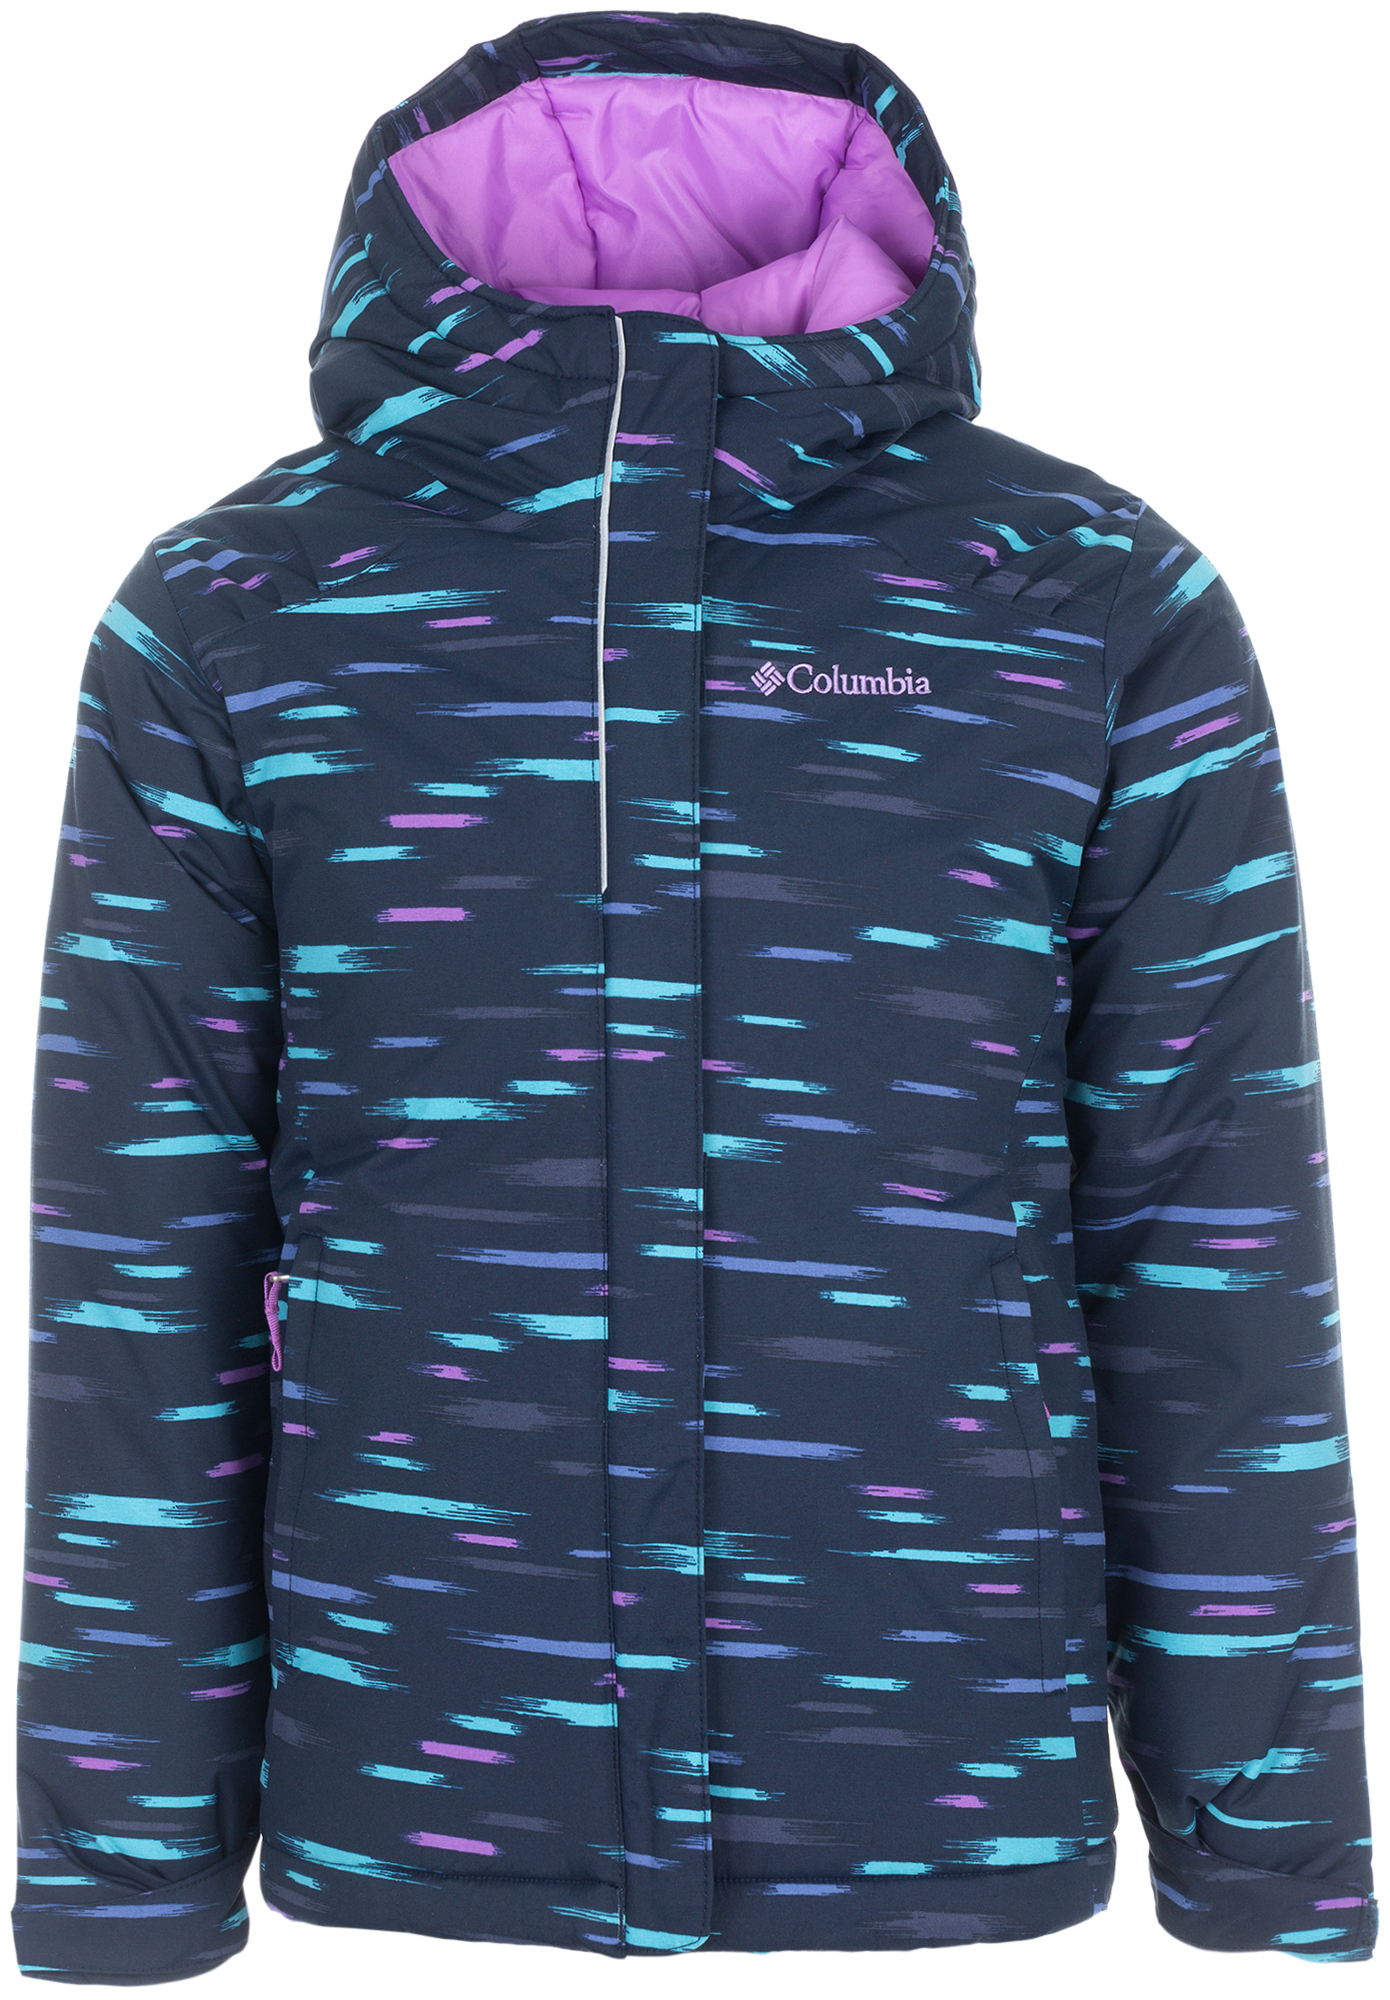 Columbia Куртка утепленная для девочек Columbia Horizon Ride columbia куртка утепленная для девочек columbia horizon ride